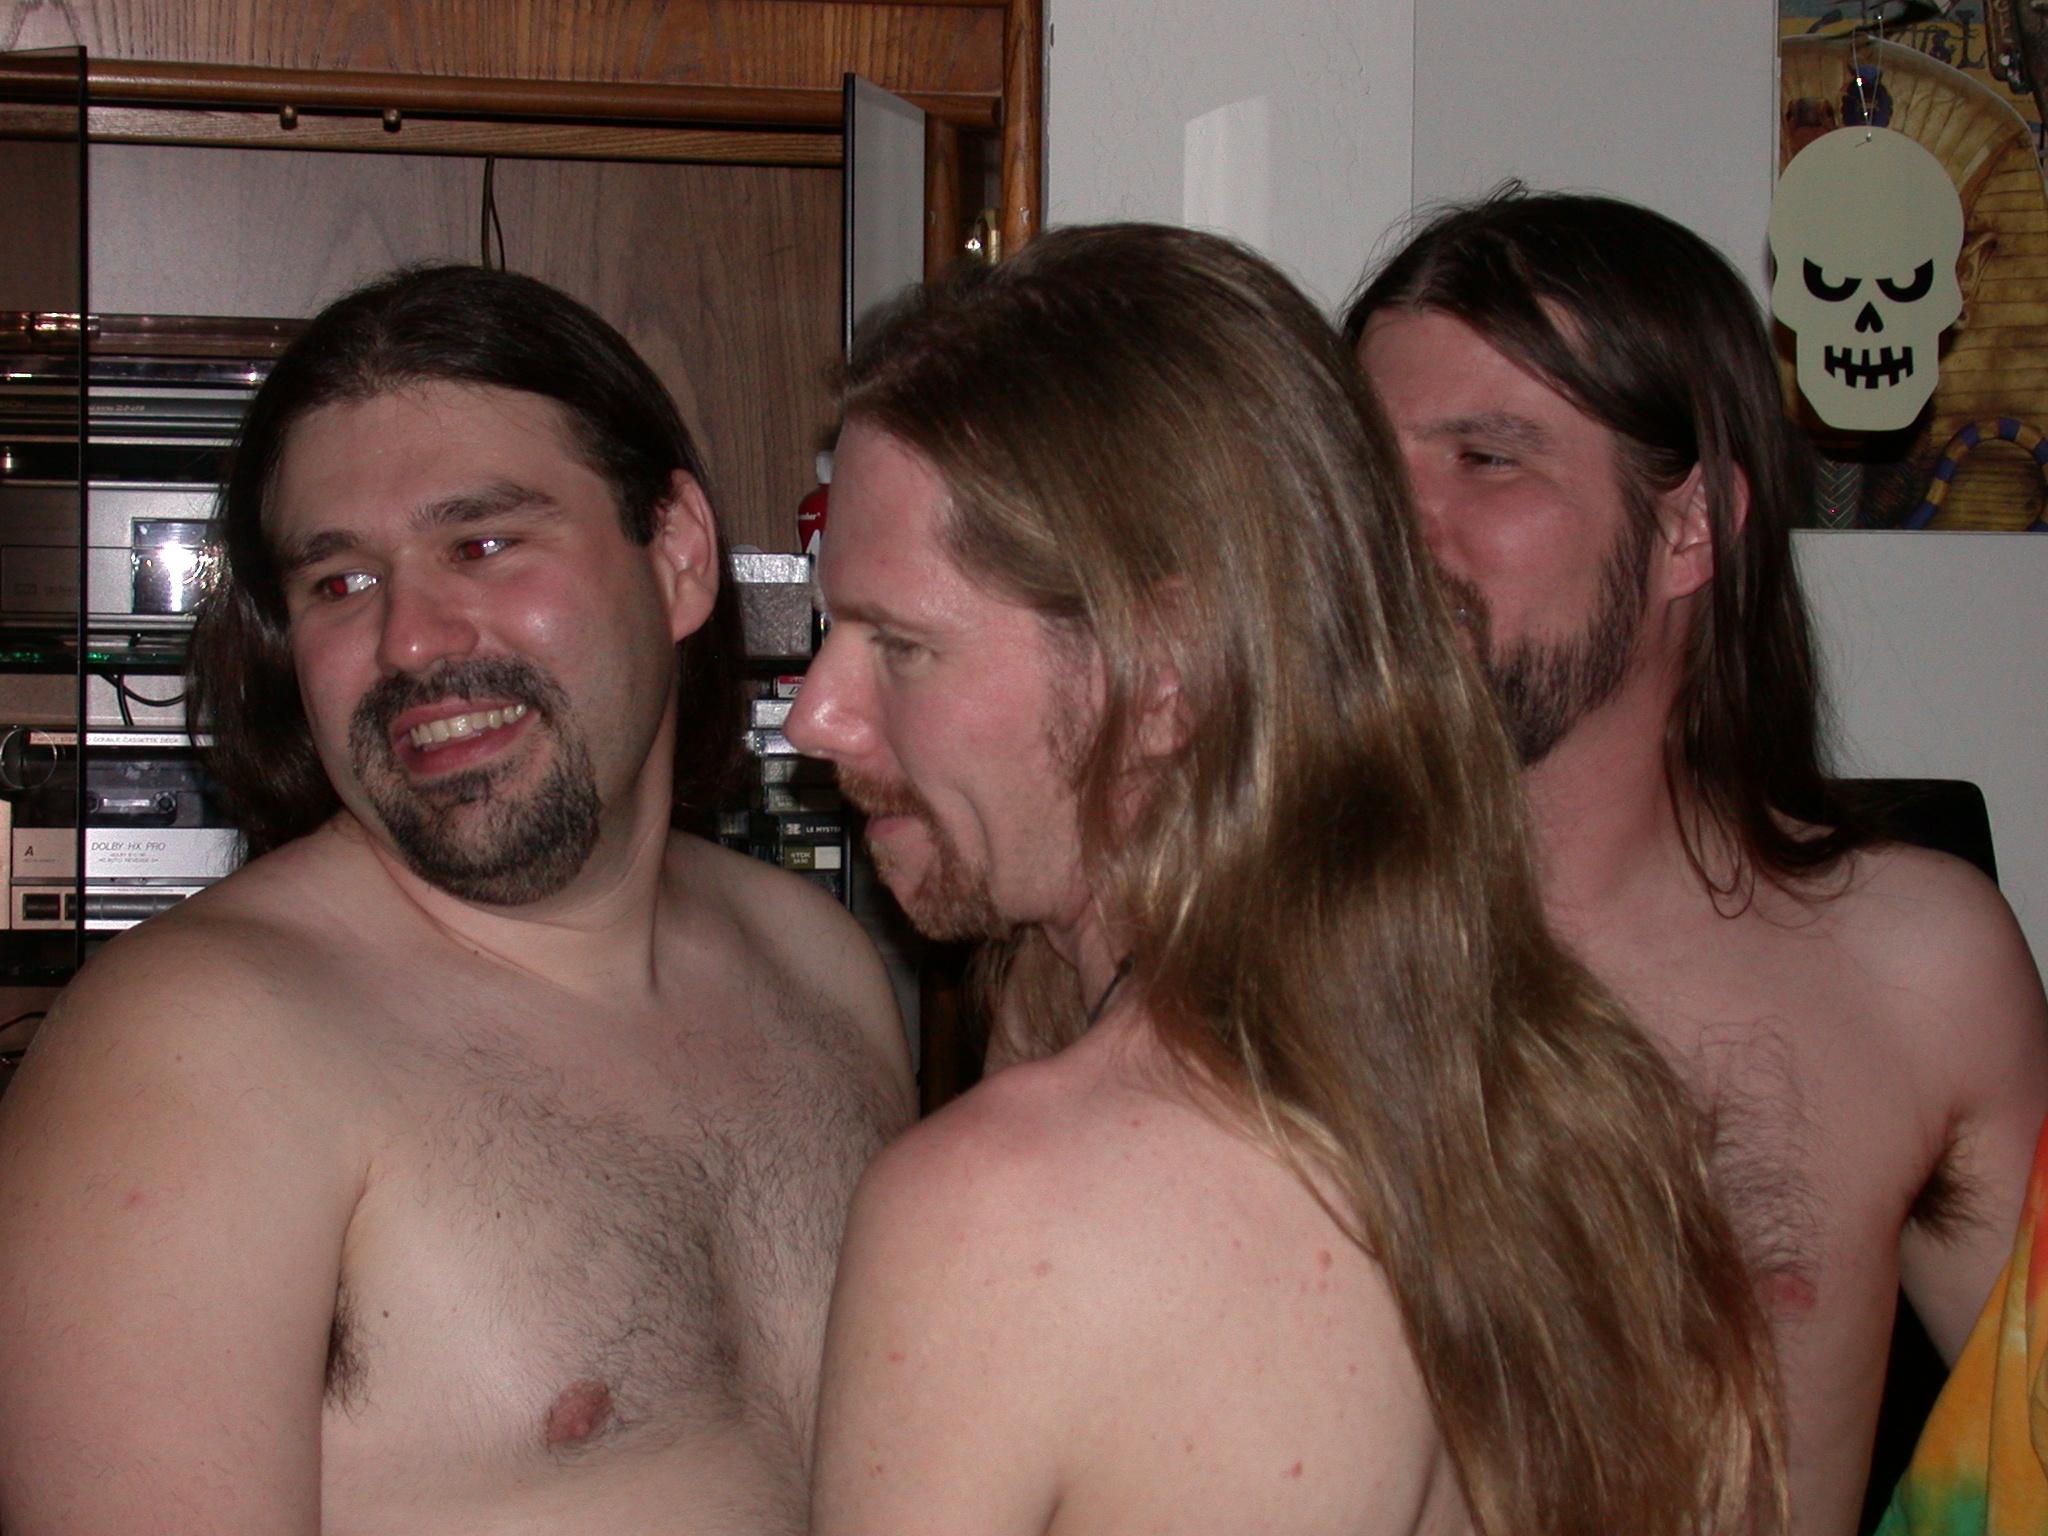 Brian, J Steve, and Robert